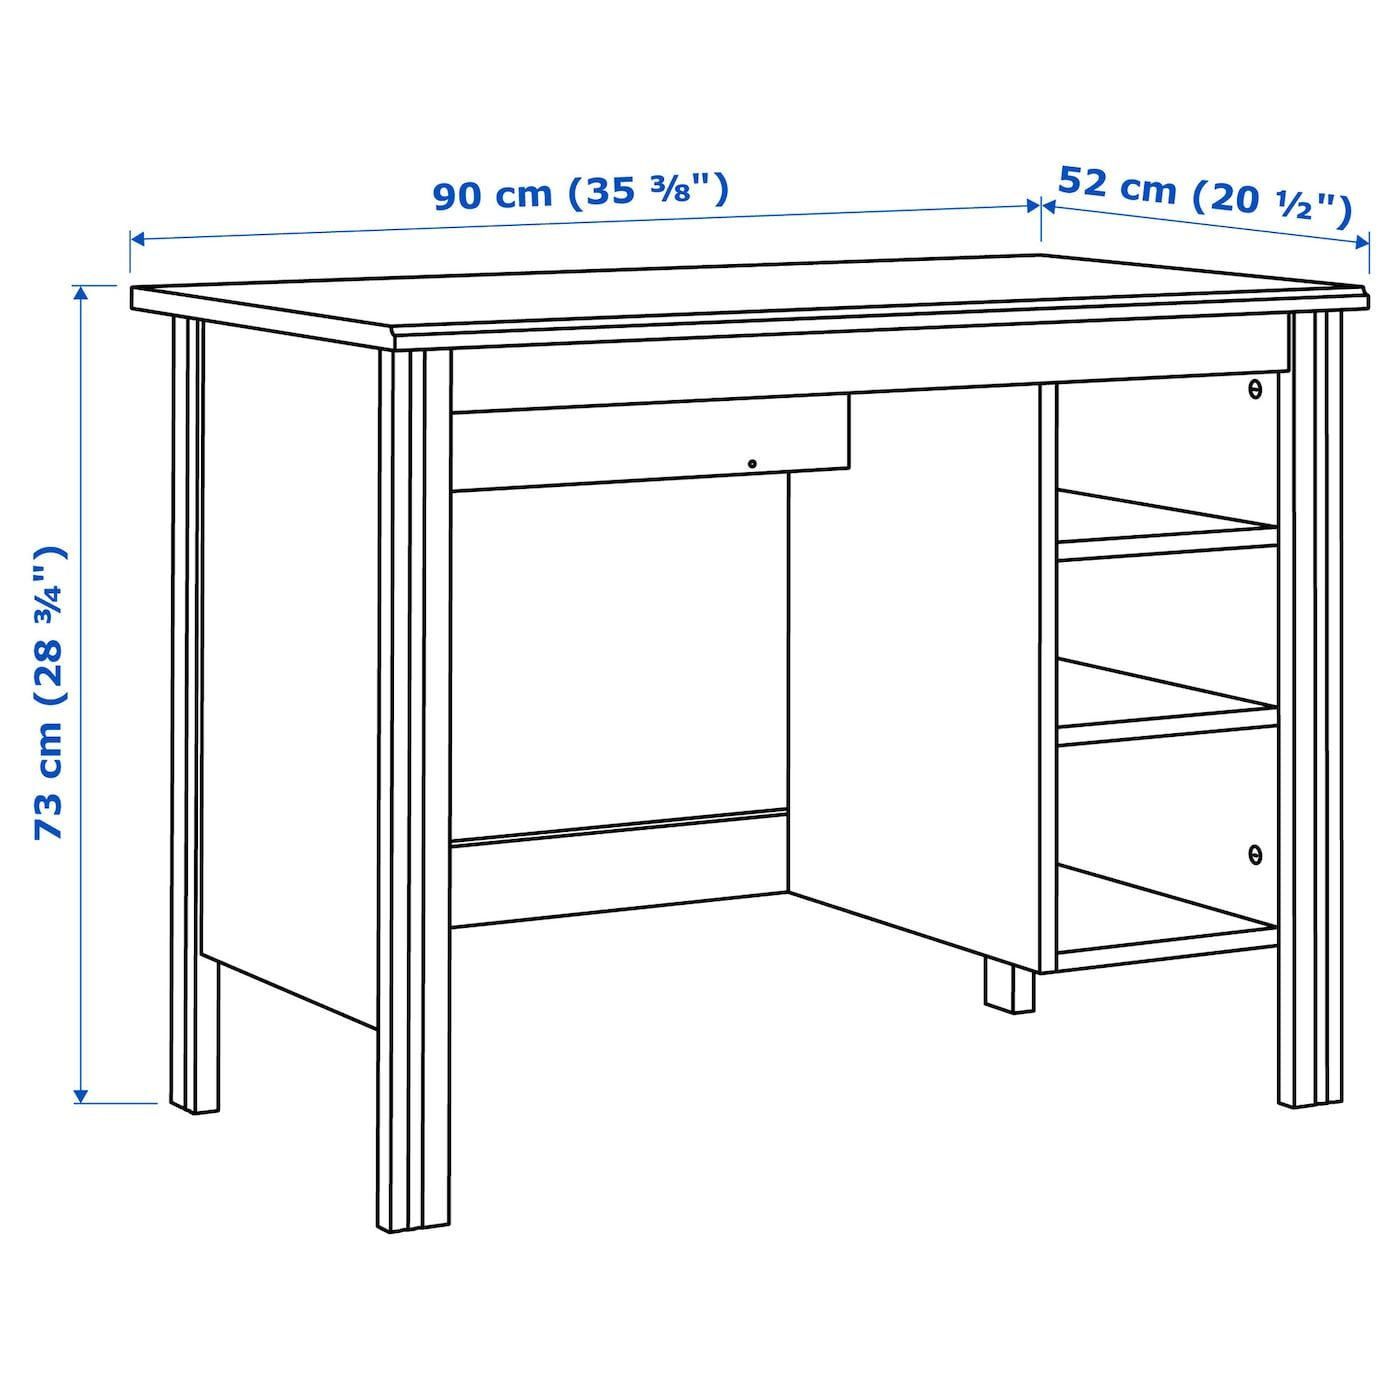 Brusali Desk Brown 35 3 8x20 1 2 Ikea In 2020 Ikea Brusali Brusali Diy Desk Plans